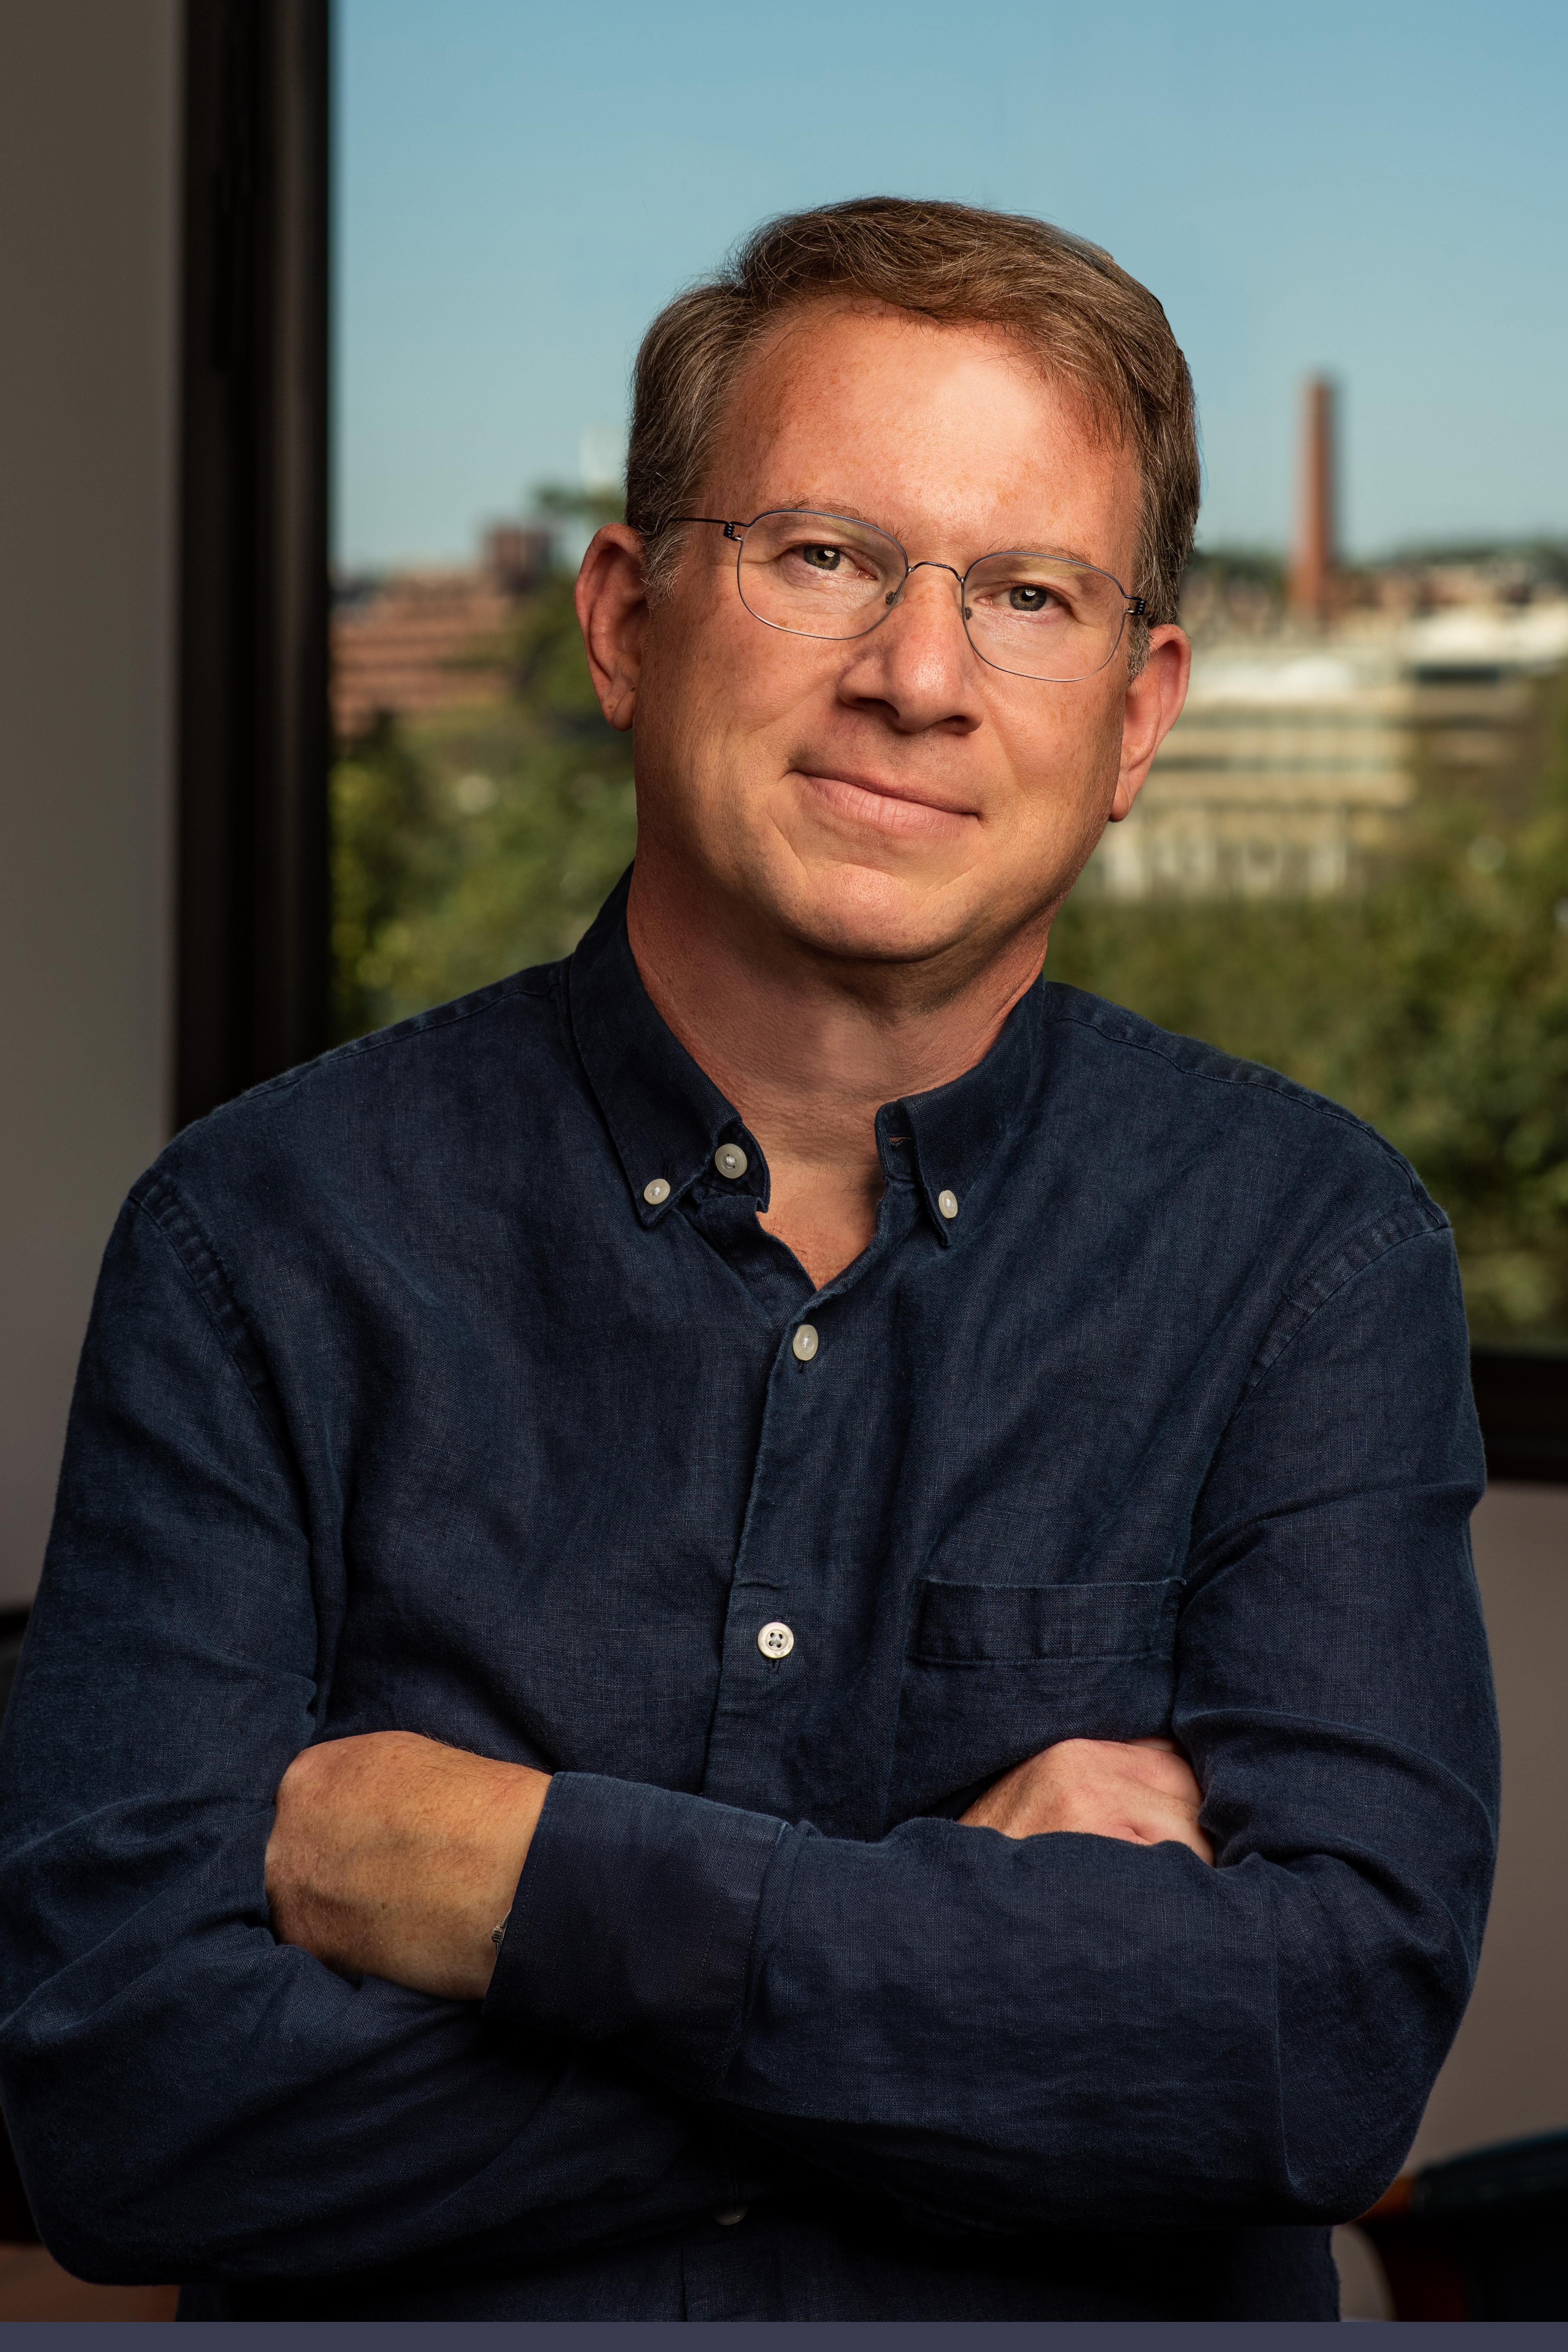 Jeffrey Goldberg